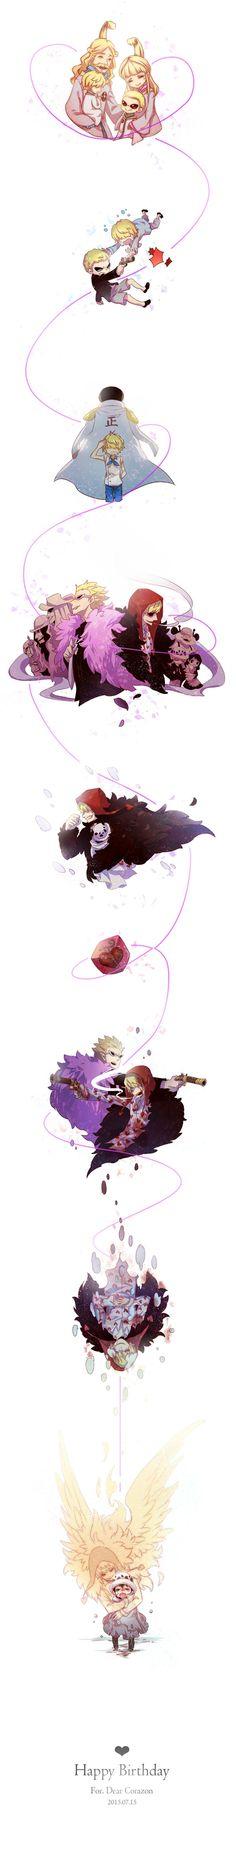 Corazons past.- Donquixote Doflamingo & Rocinante (Corazon) (Corasan, Cora-san) family One Piece Trafalgar D. Anime One Piece, One Piece 1, One Piece Fanart, Zoro, Manga Anime, Anime Art, Otaku, Monkey D Luffy, Fairytail